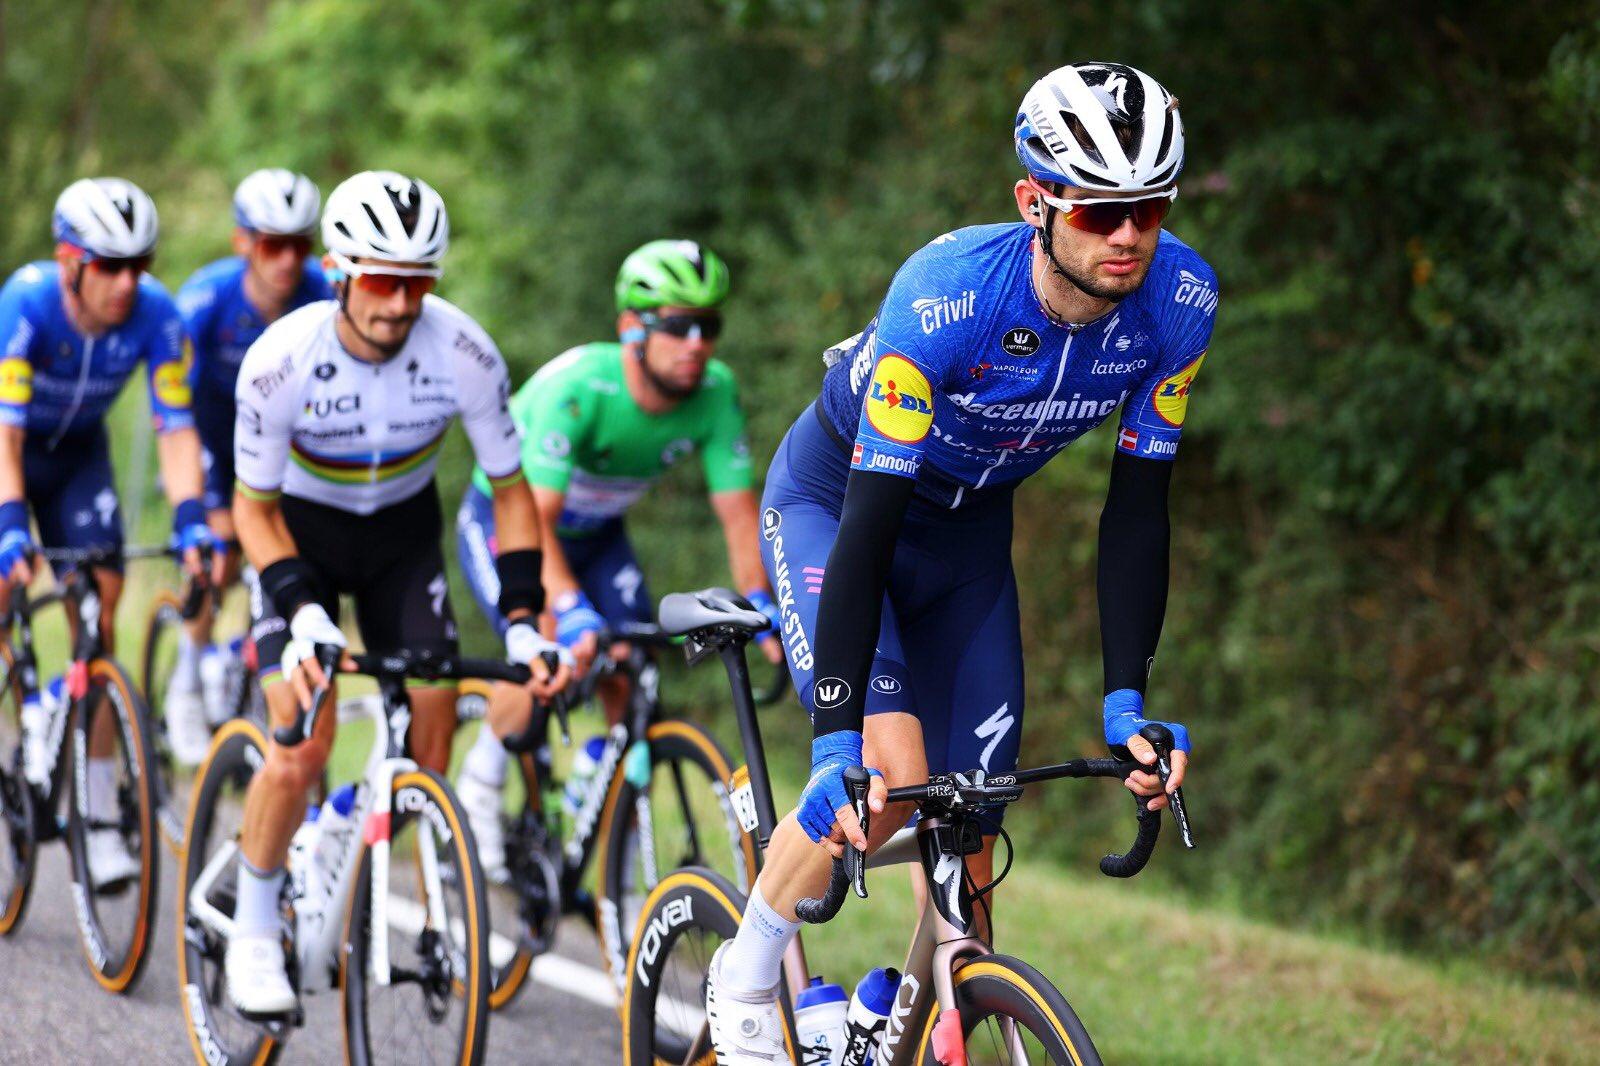 cycling tour de france 2021 mark cavendish julian alaphilippe deceuninck-quickstep team